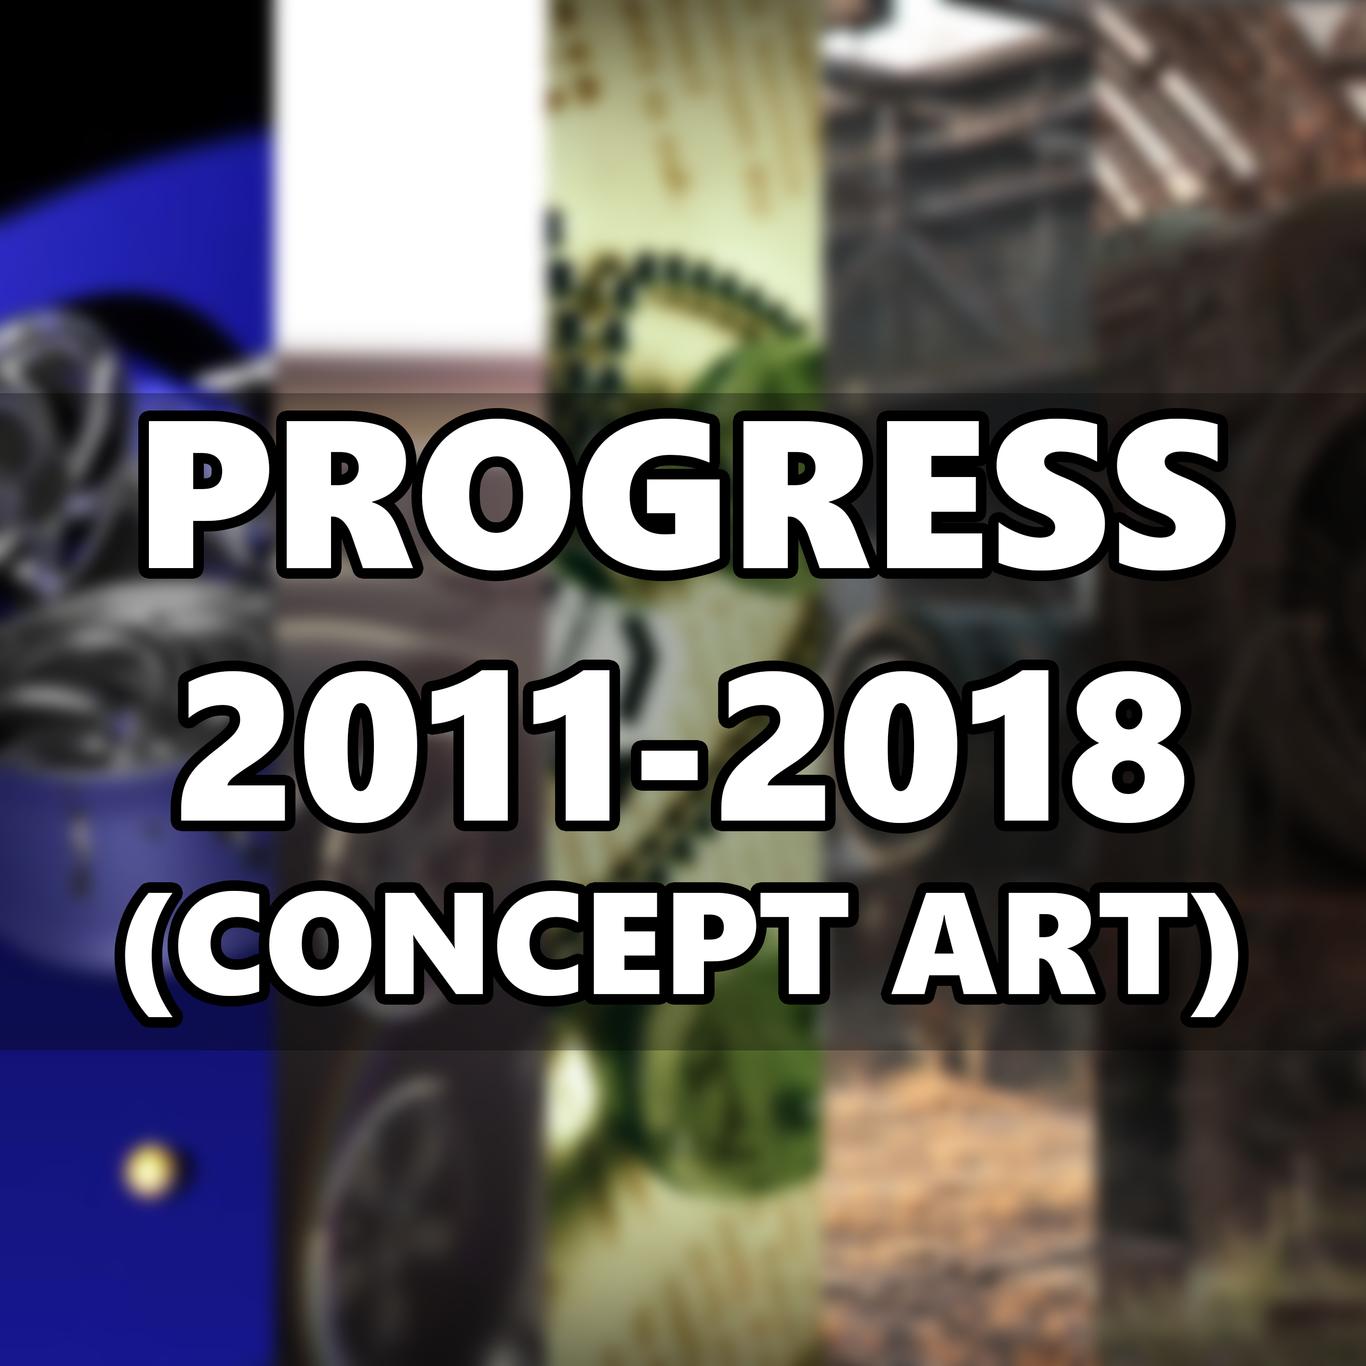 Milosbelanec progress 2011 2018 1 399664cc o4bf